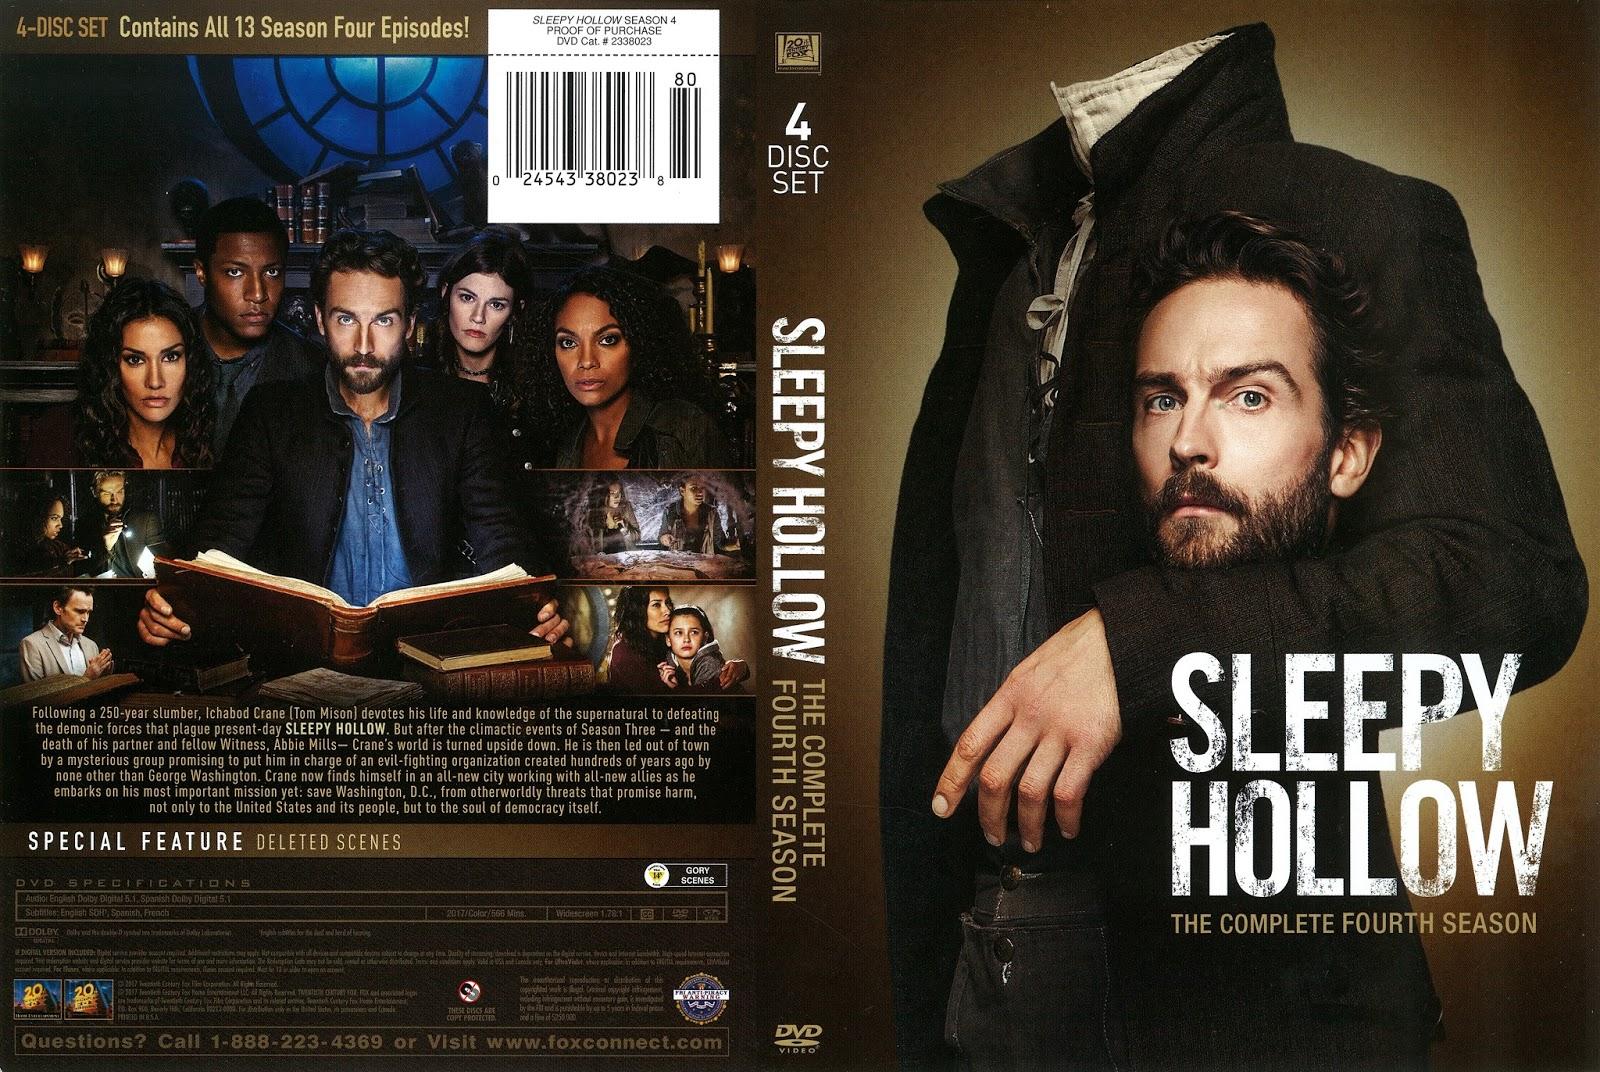 Sleepy Hollow Season 4